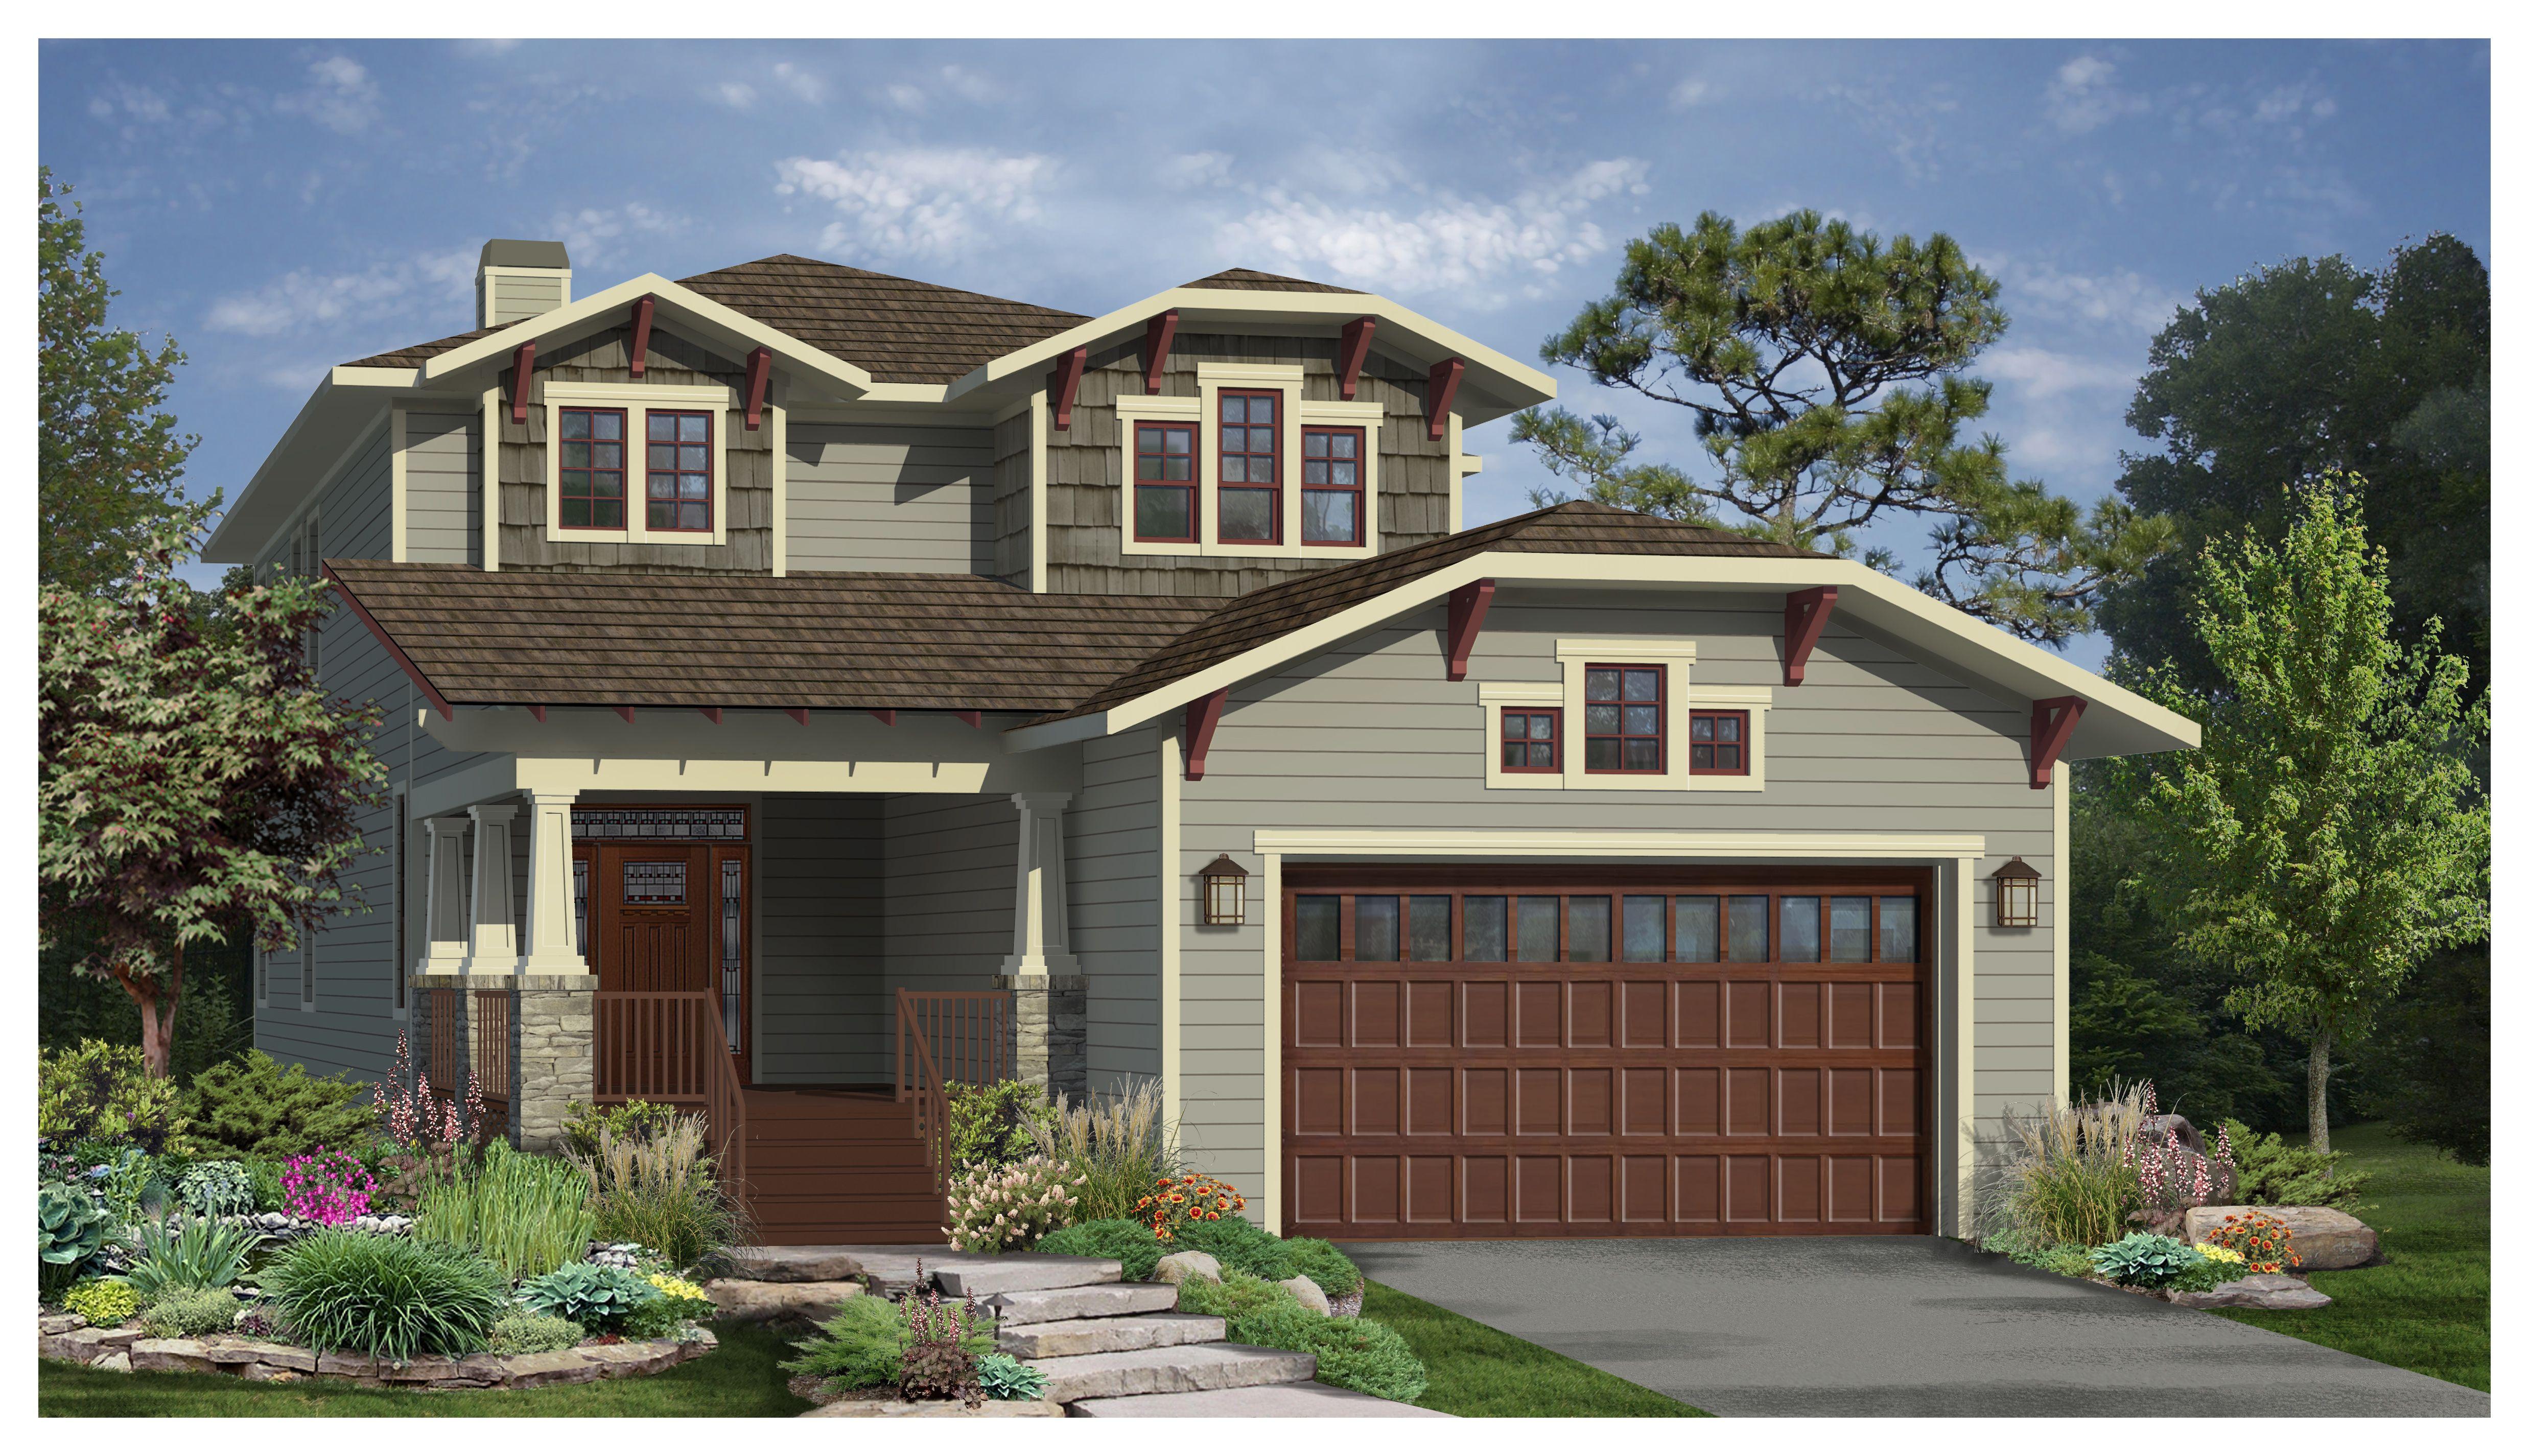 The Centennial   Plus Sq Ft House Plans Design Tech Homes - Design tech homes pricing